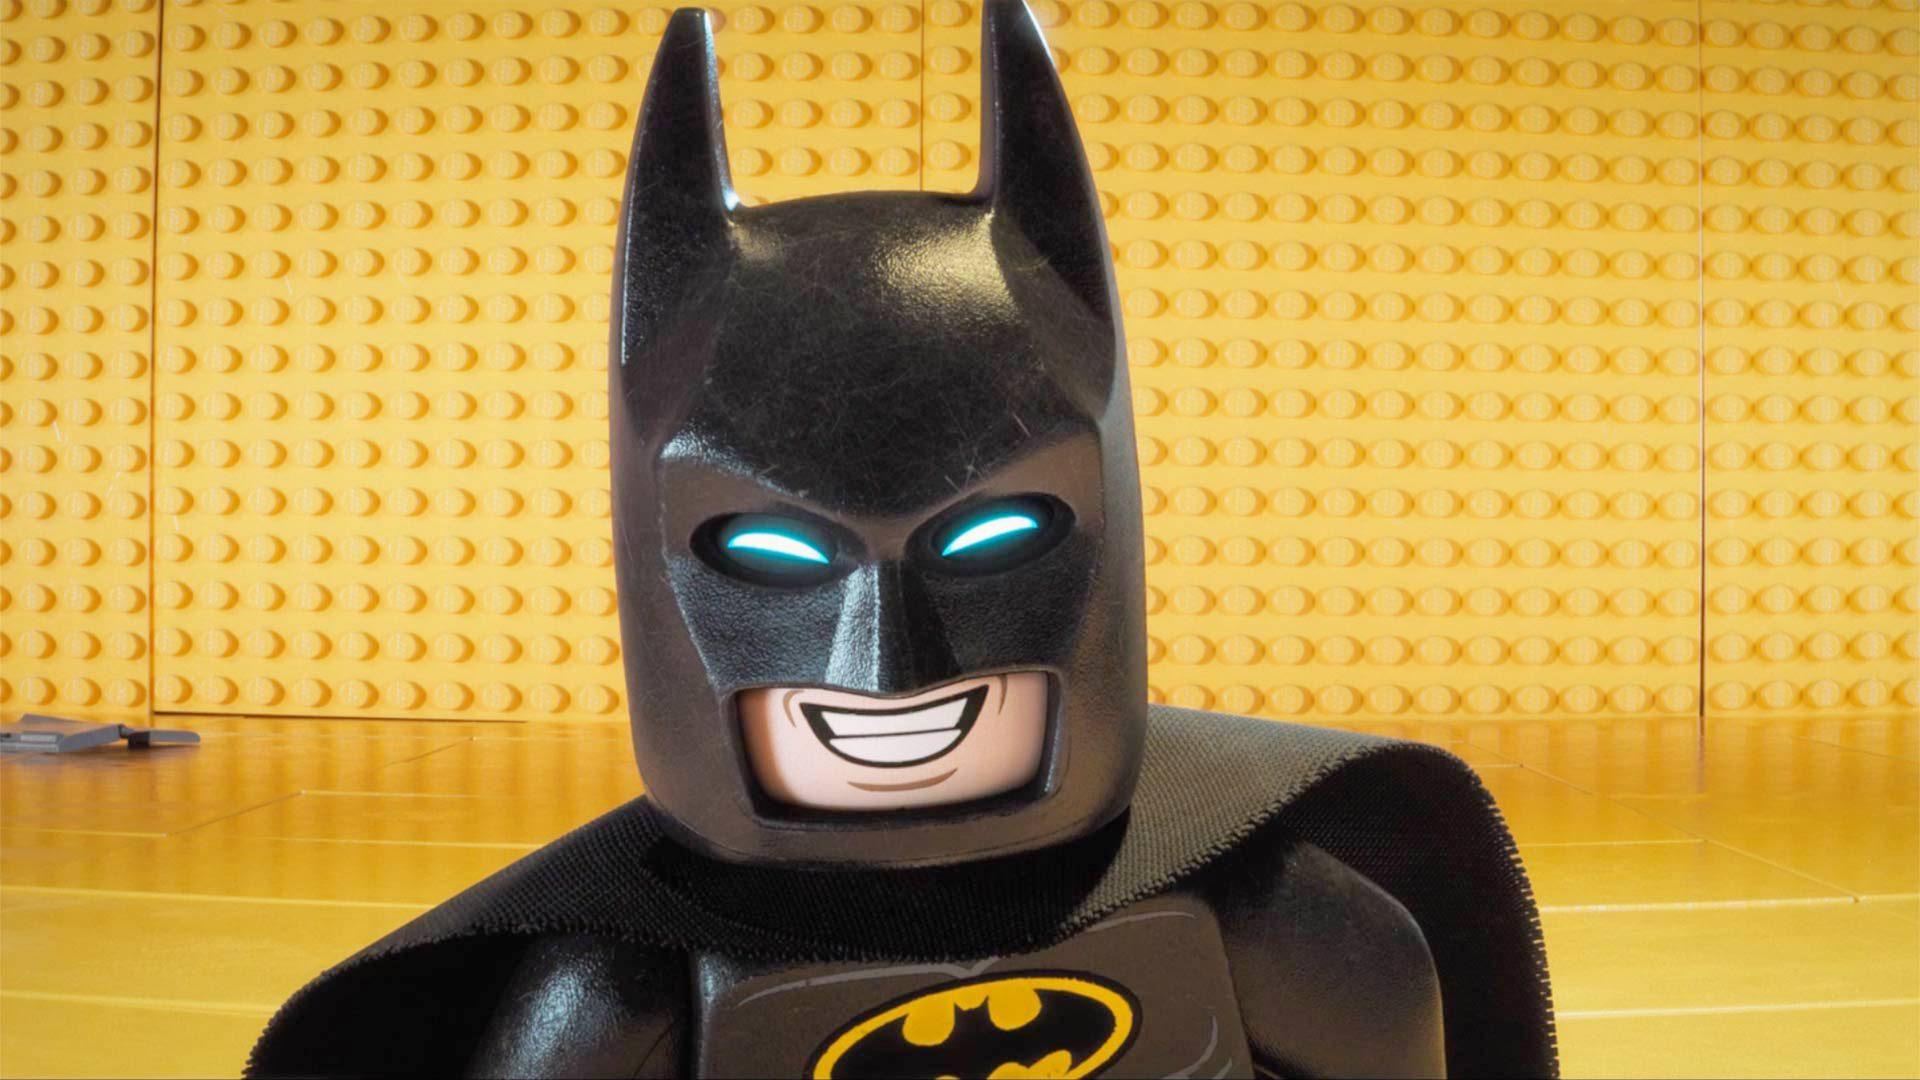 Batman Jacket Made of Legos Hits the Red Carpet